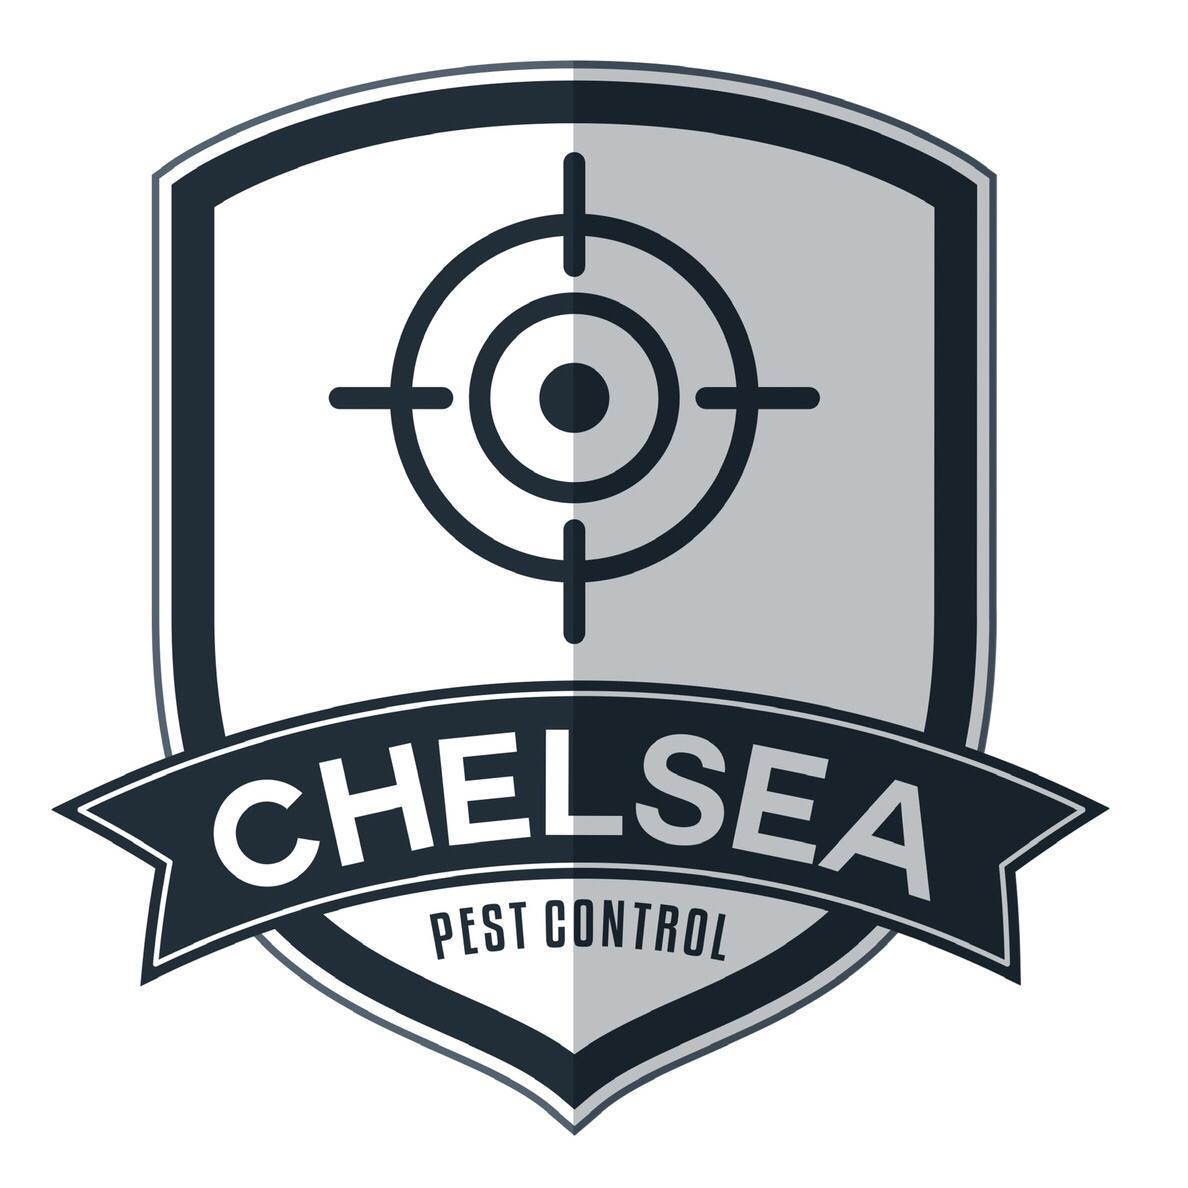 Chelsea Pest Control